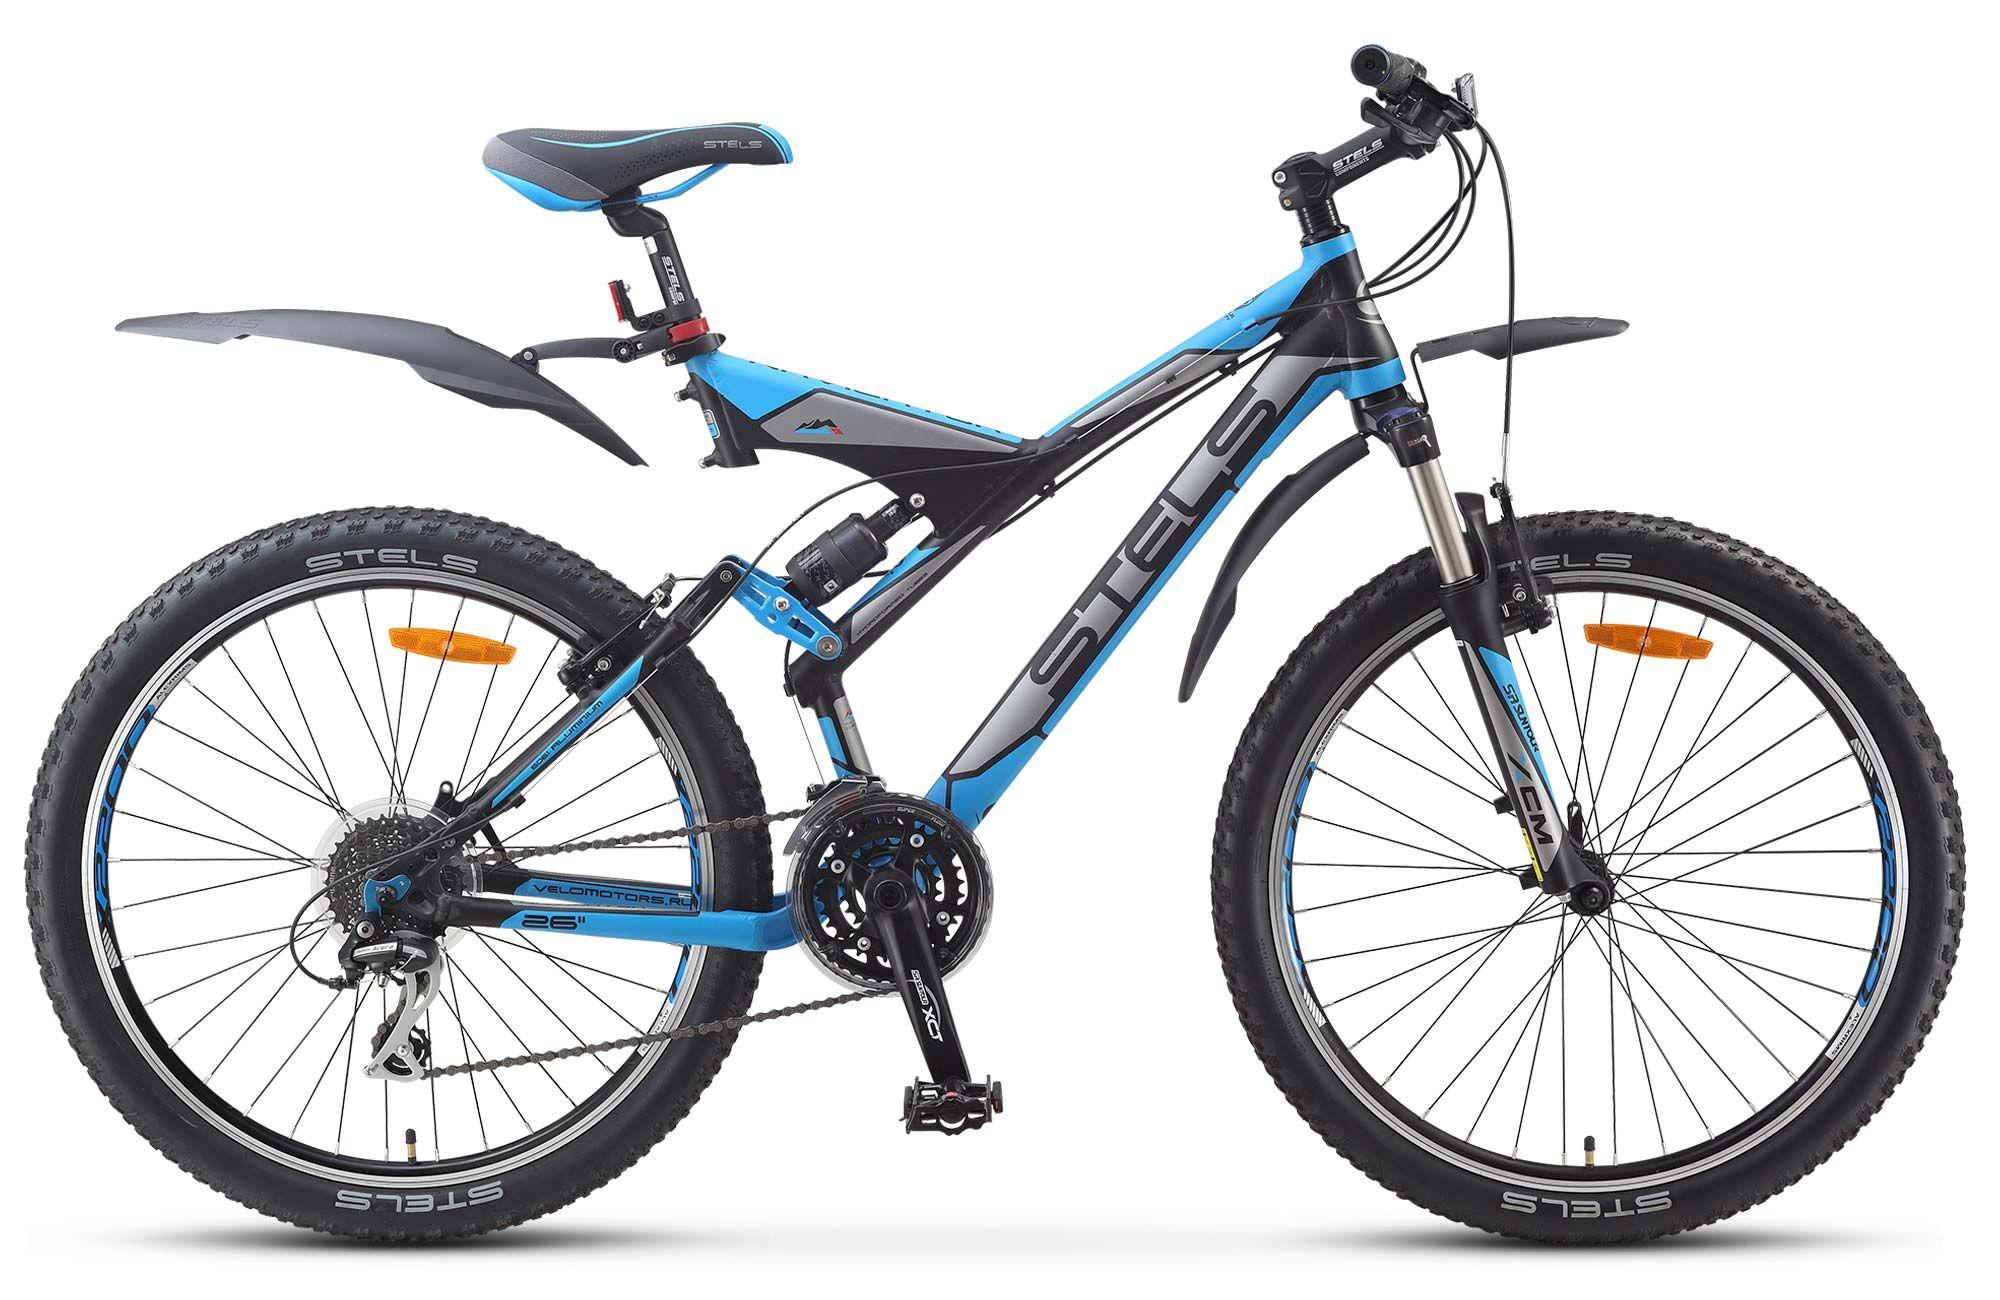 Велосипед Stels Navigator V 2016,  Двухподвесы  - артикул:262008